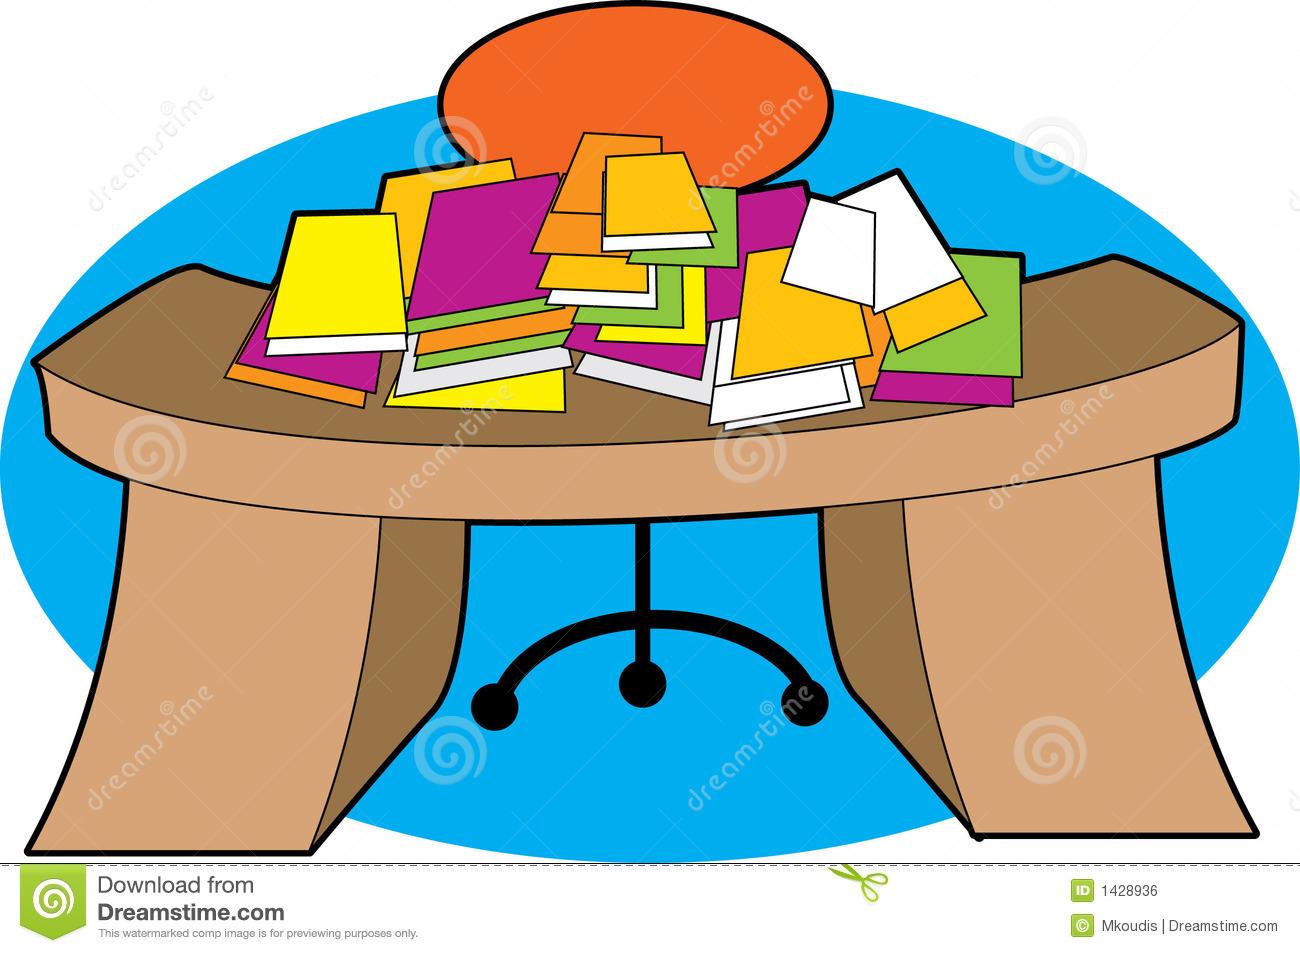 Messy Desk Royalty Free Stock Image-Messy Desk Royalty Free Stock Image-10